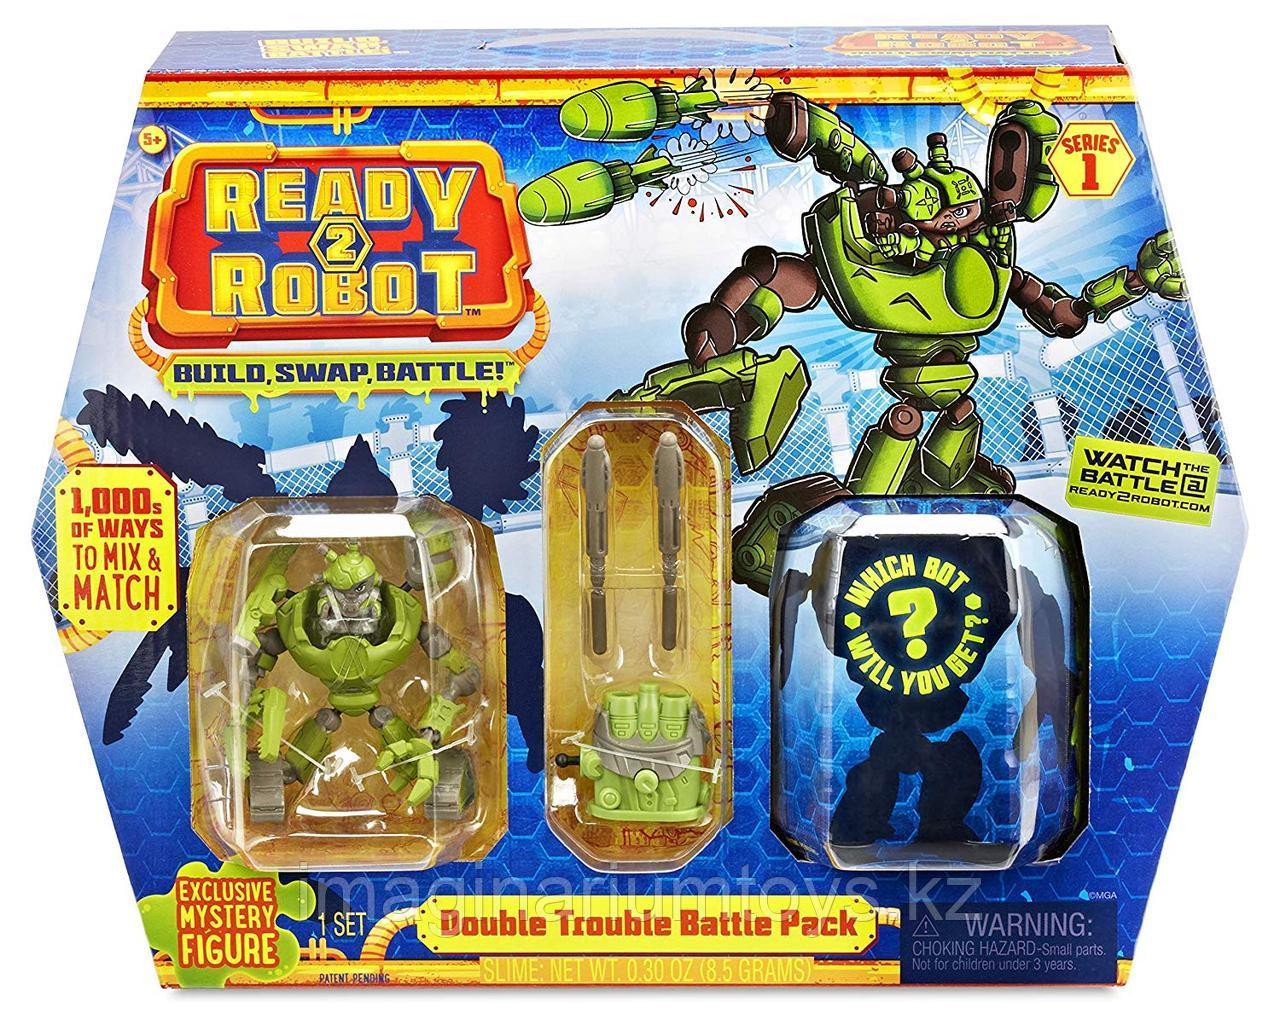 Ready2Robot игровой набор Double Trouble